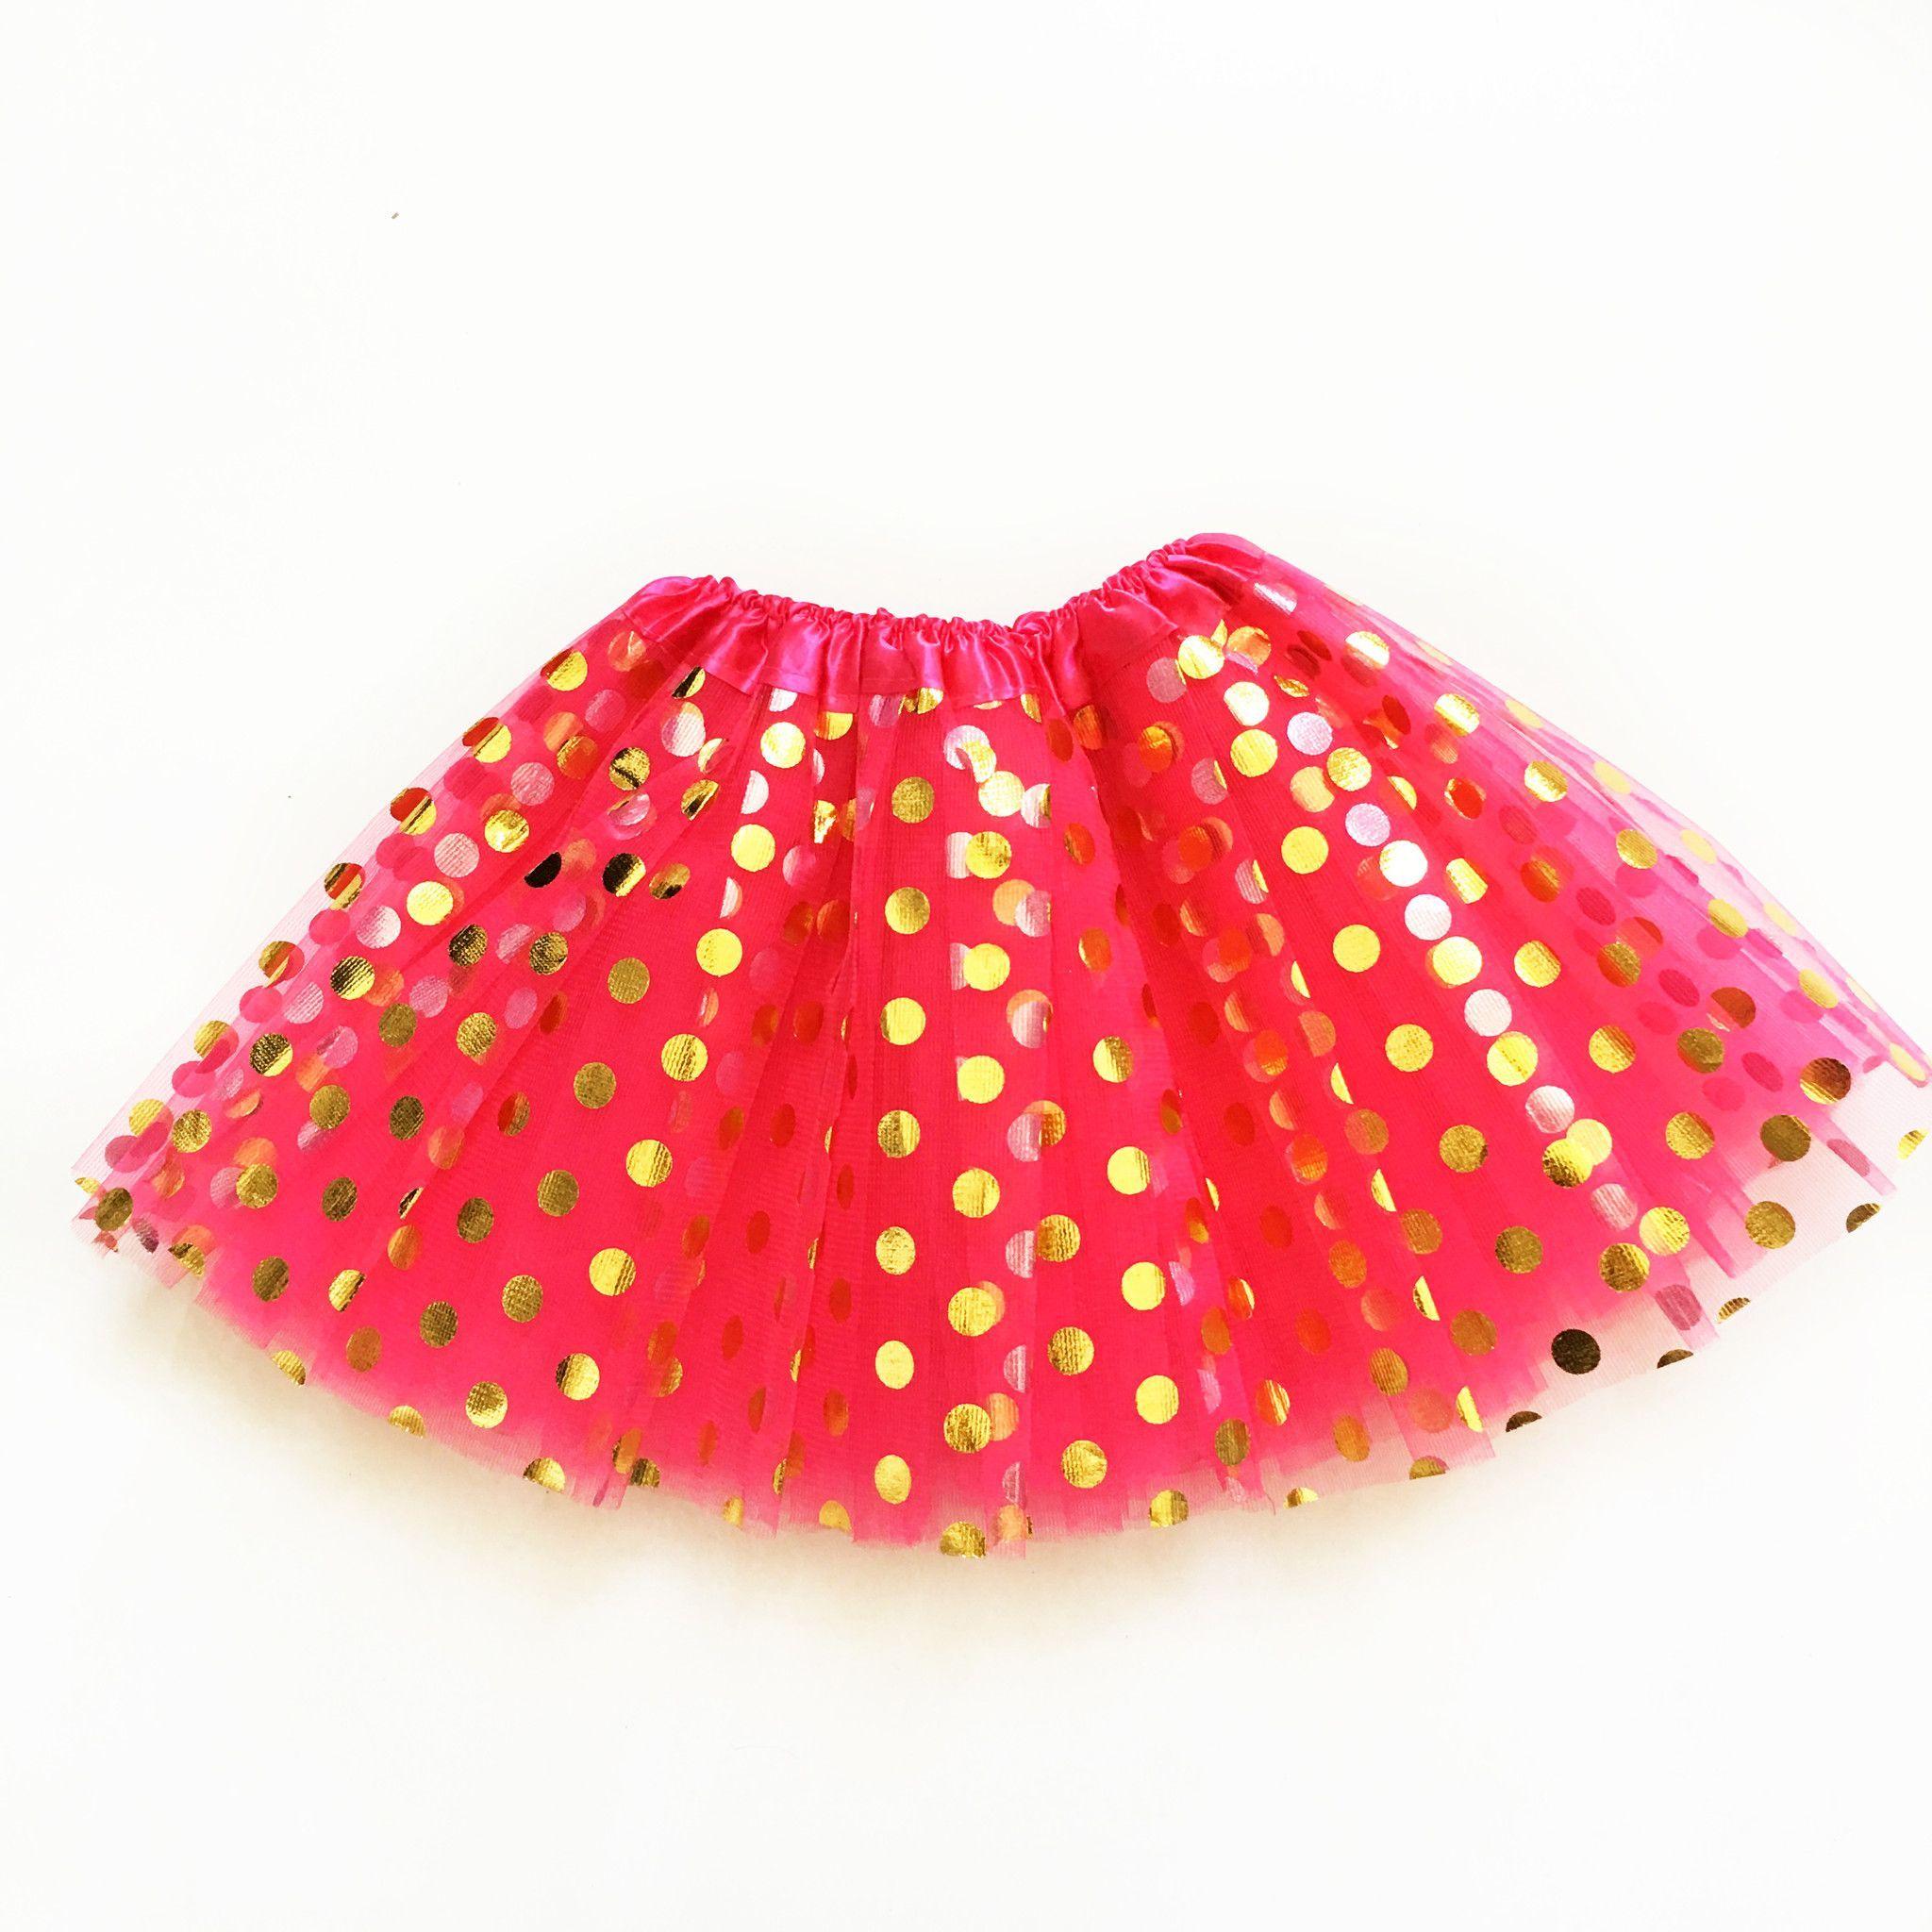 tutu skirt hot pink with metallic gold polkadots products